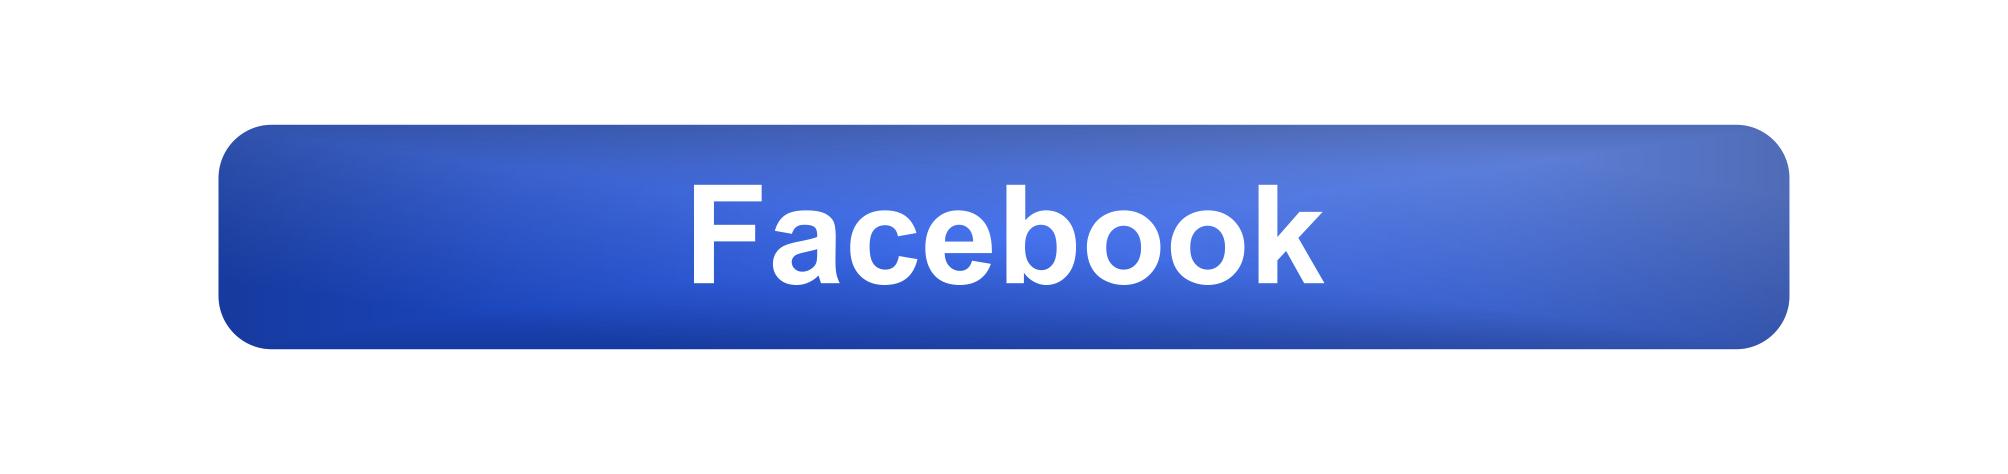 SocialMedia_Link-Facebook